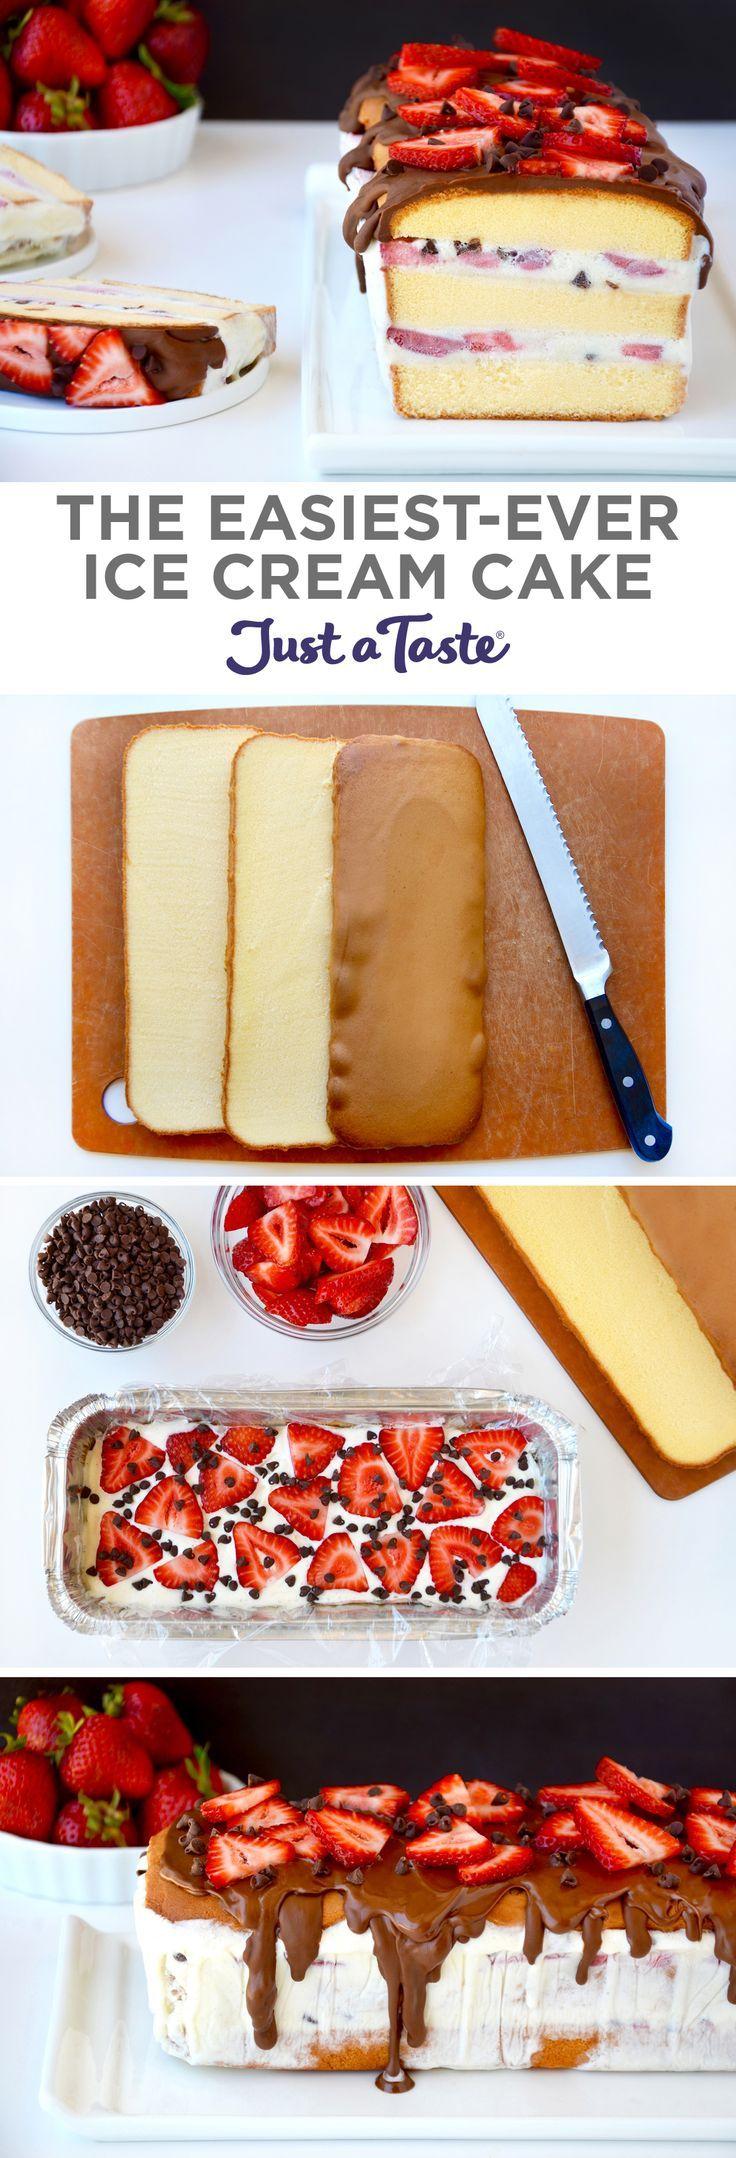 The Easiest-Ever Ice Cream Cake | recipe via http://justataste.com